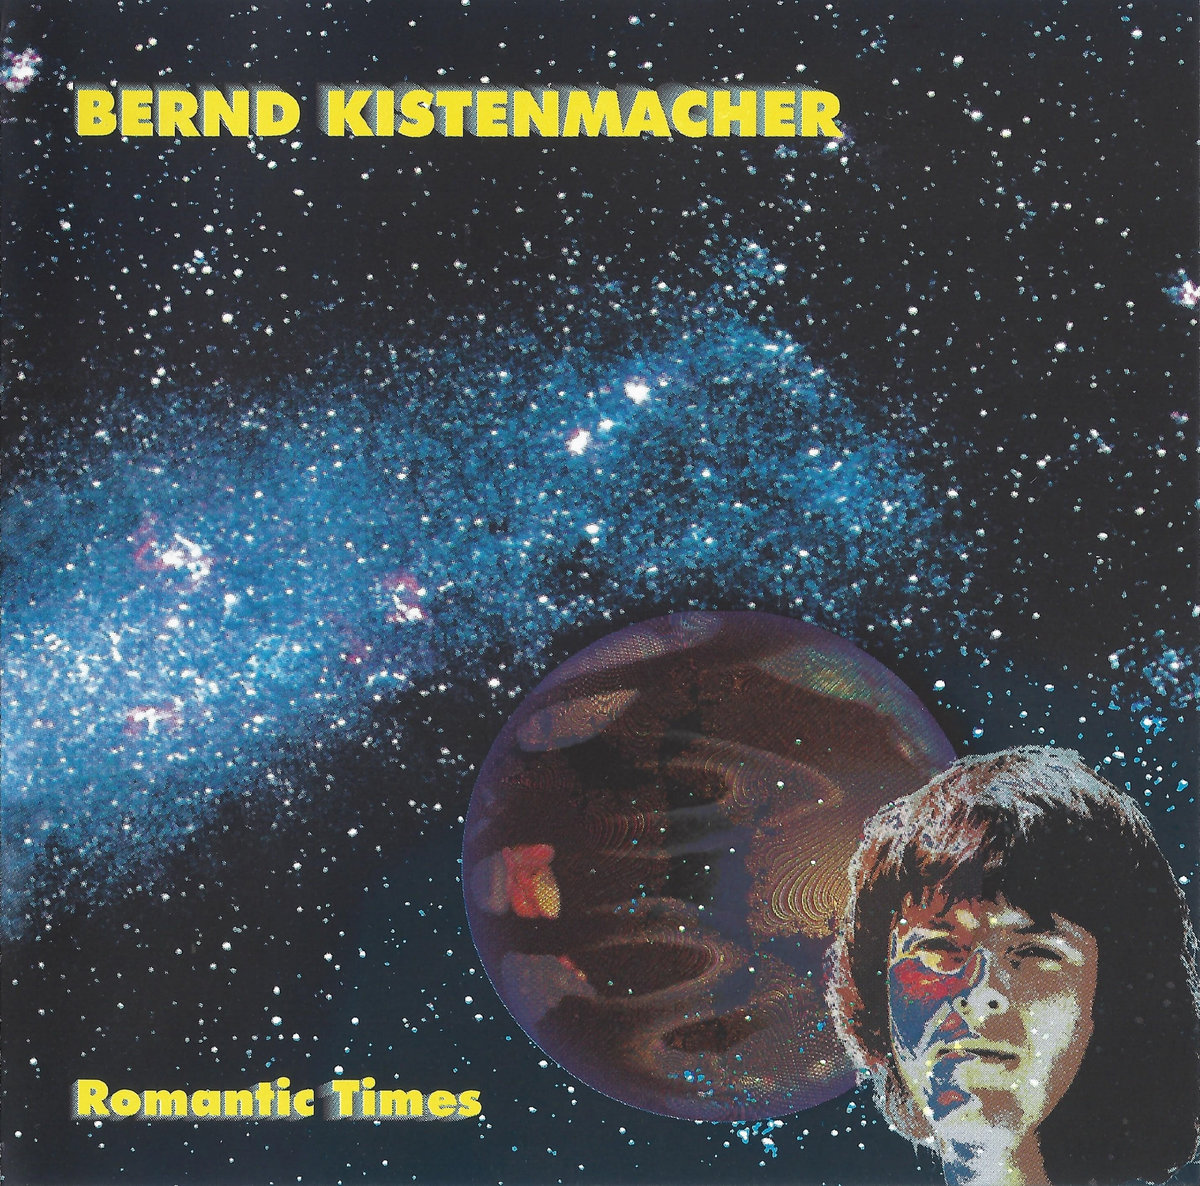 Romantic Times (19861999)  Bernd Kistenmacher